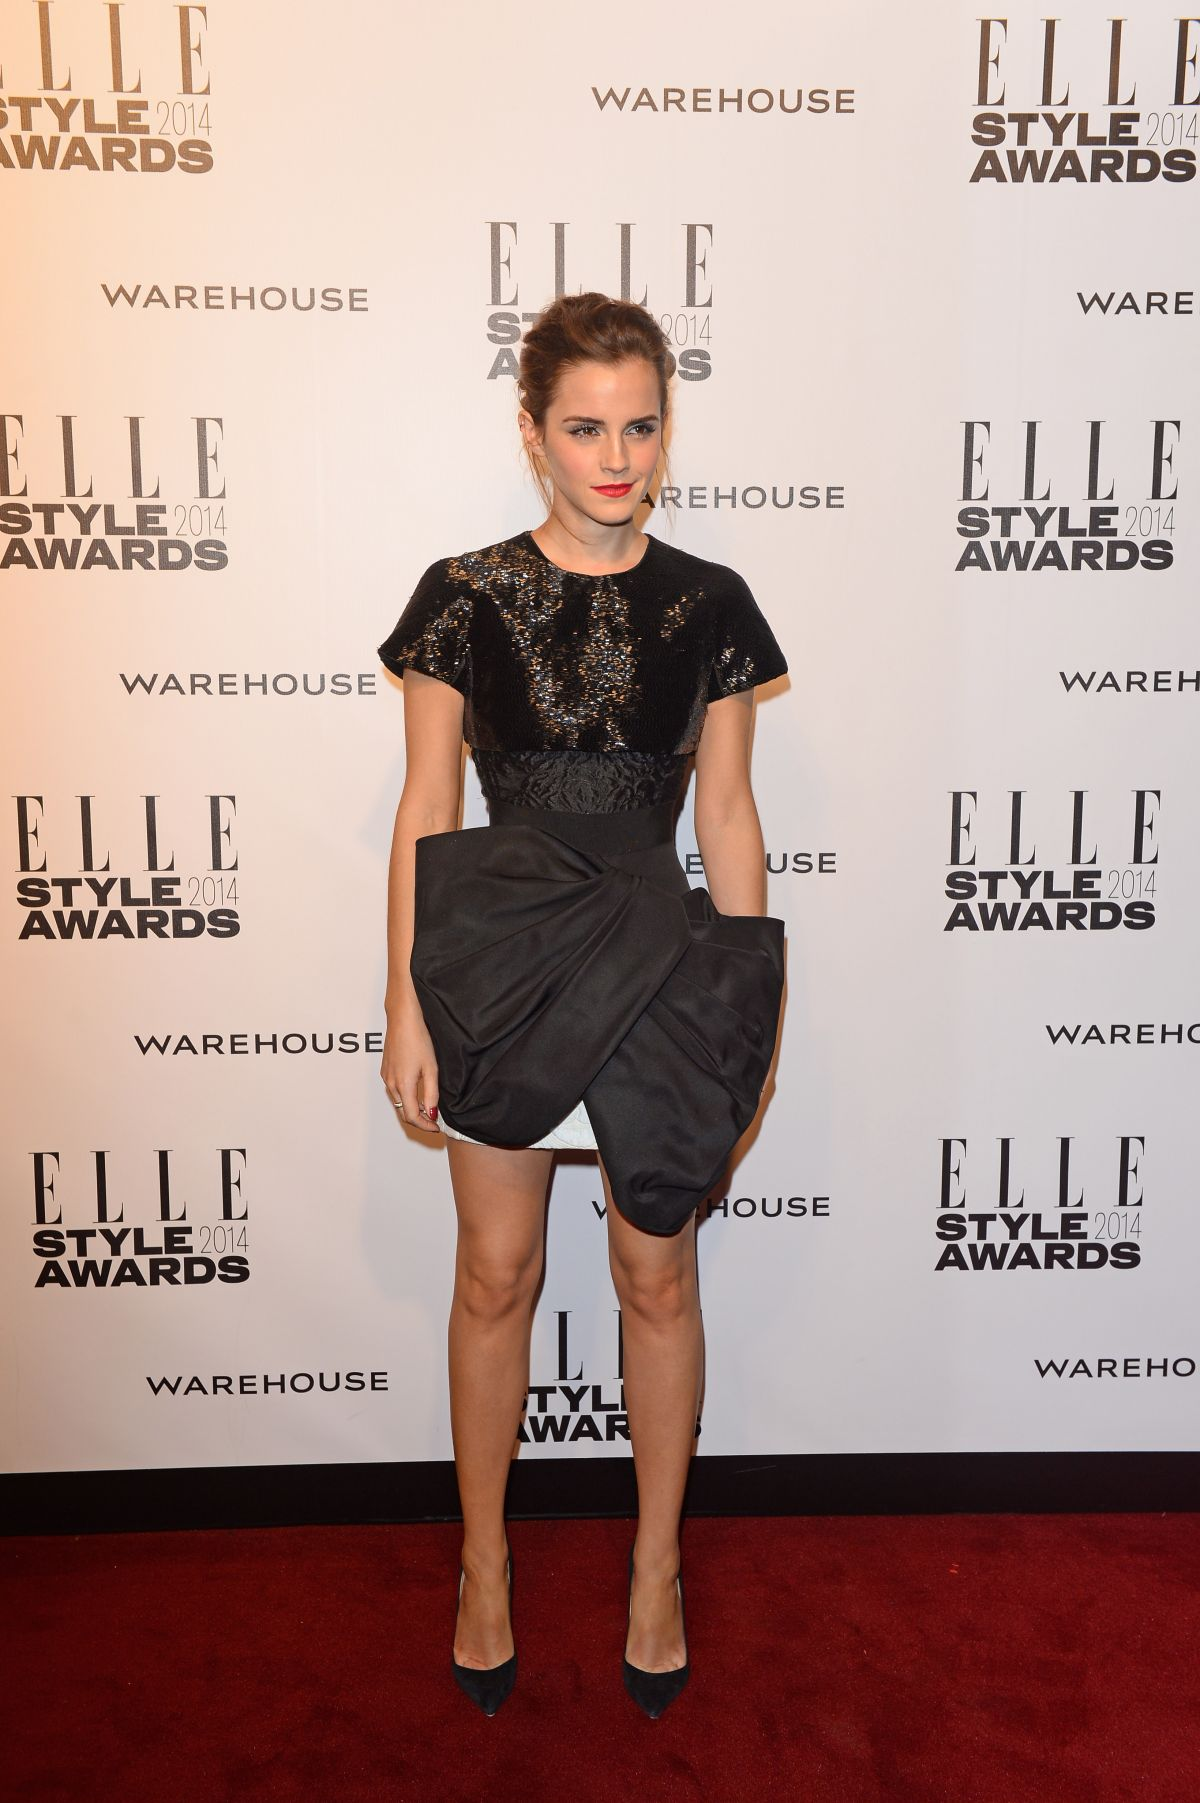 EMMA WATSON at 2014 Elle Style Awards in London